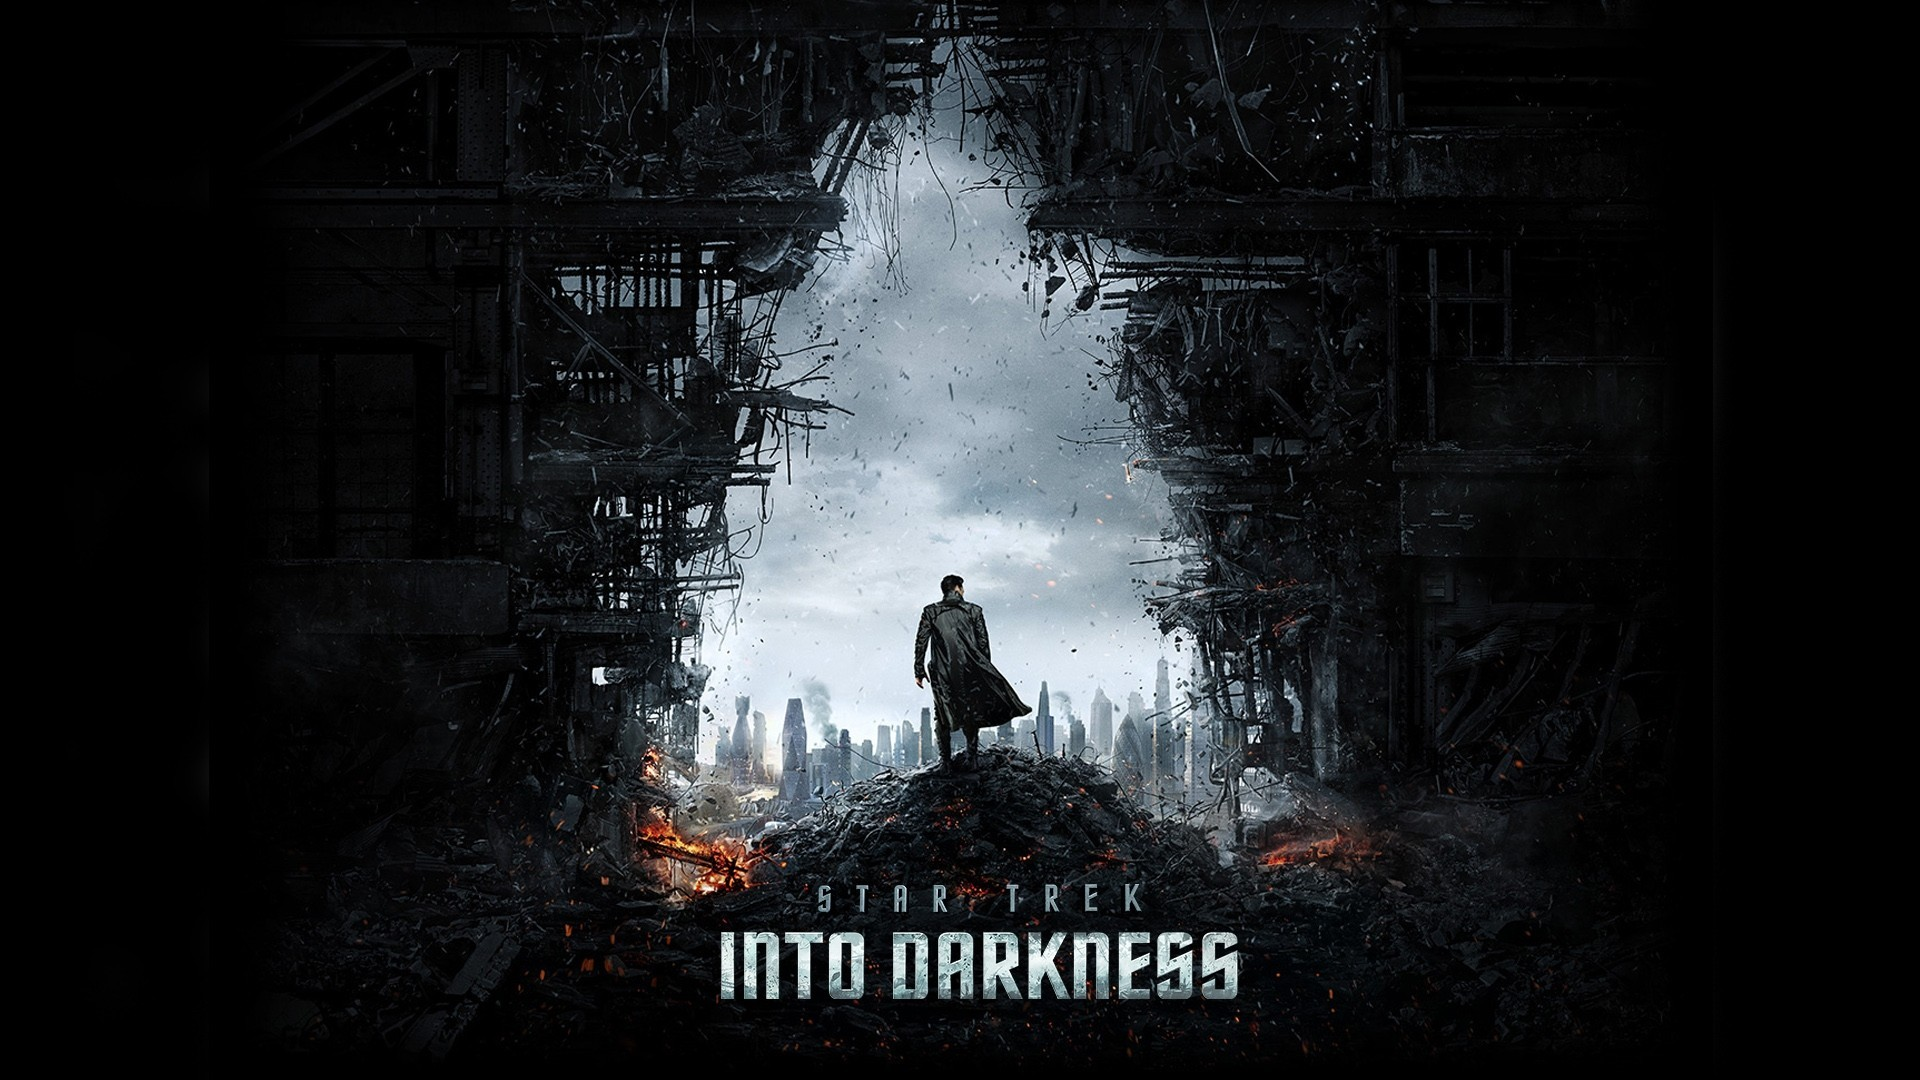 Amazoncom Star Trek Into Darkness Bluray DVD Digital HD Chris Pine Zachary Quinto Karl Urban Zoe Saldana Simon Pegg John Cho Anton Yelchin Benedict